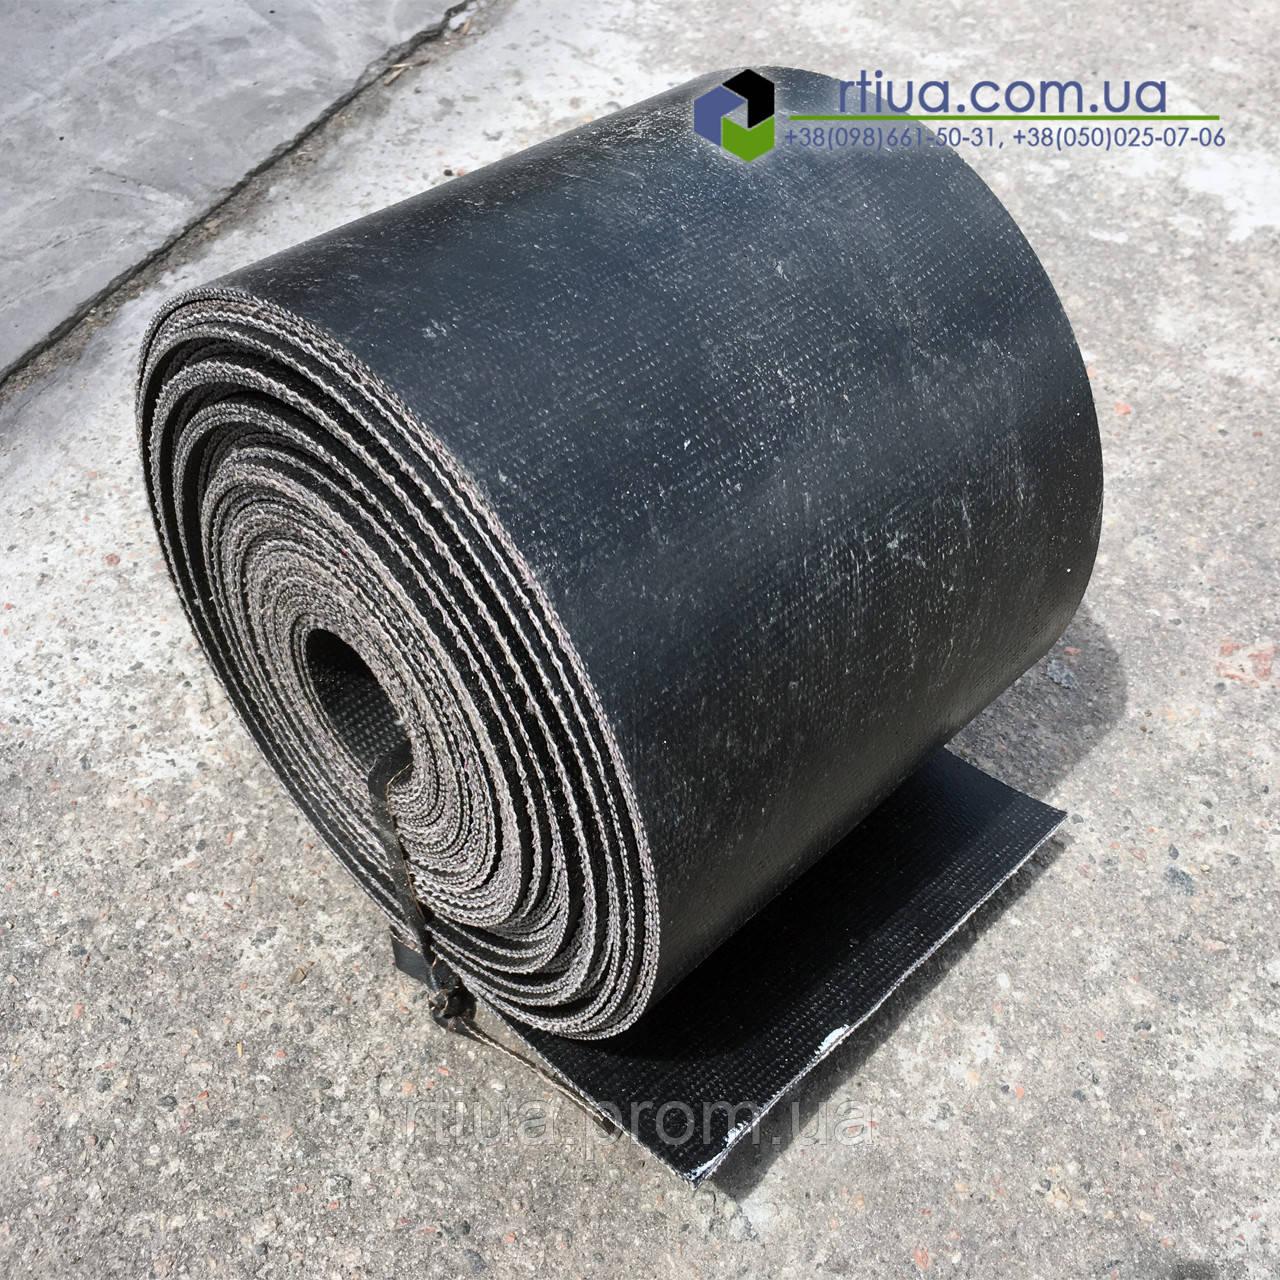 Транспортерная лента ТК-200, 1000х4 - 5/2 (11 мм)